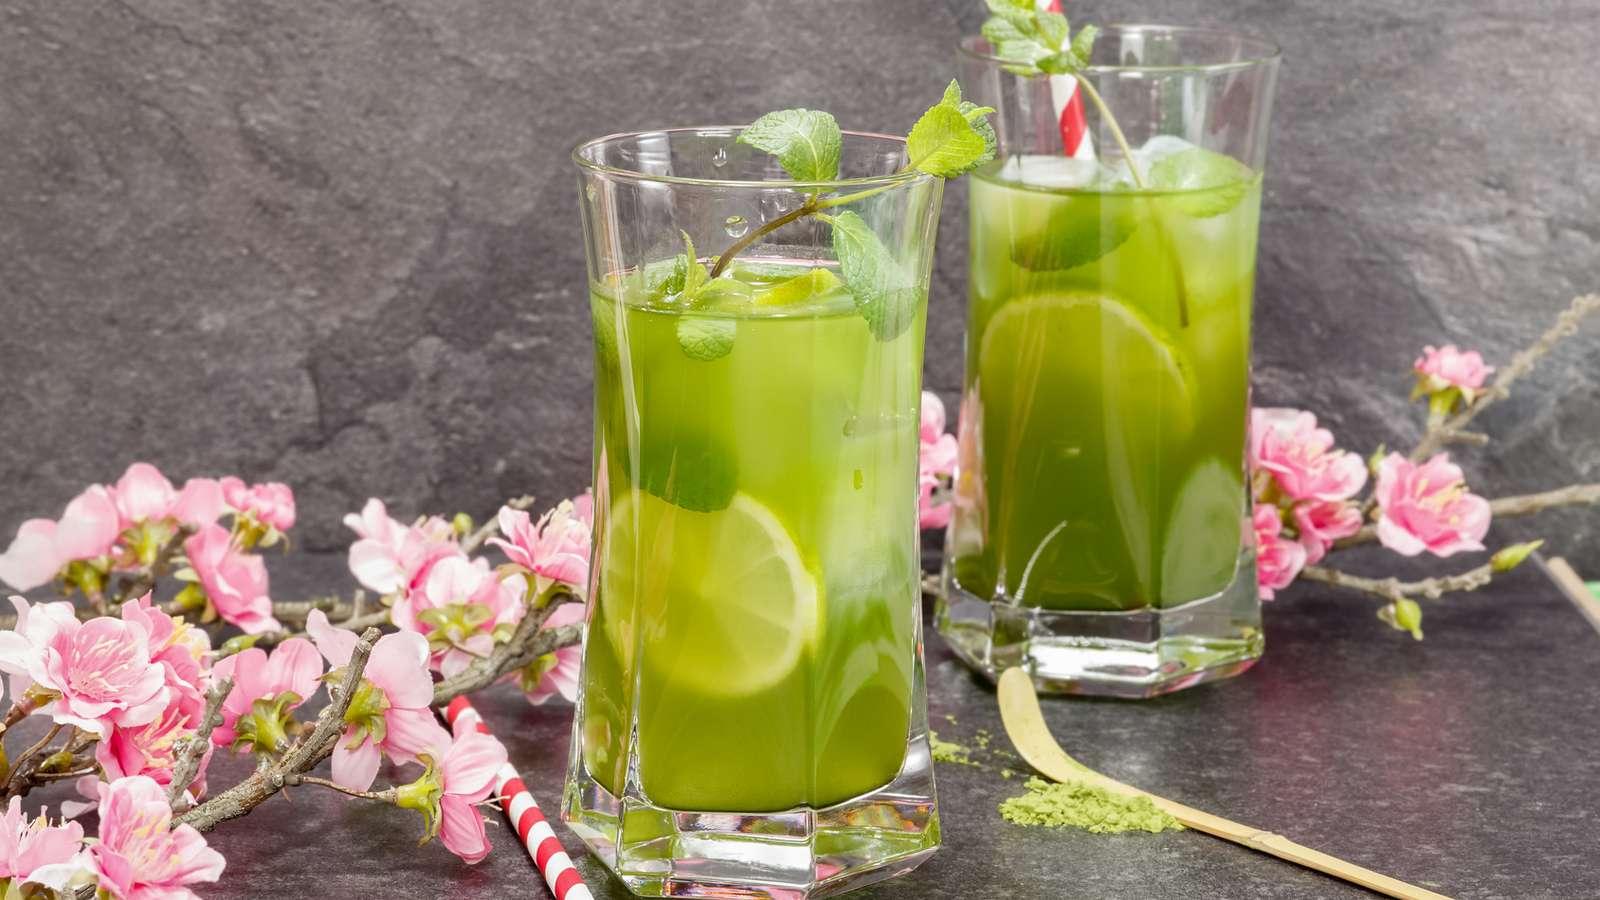 Eistee selber machen - gesunde kalte Tee-Getränke | evidero